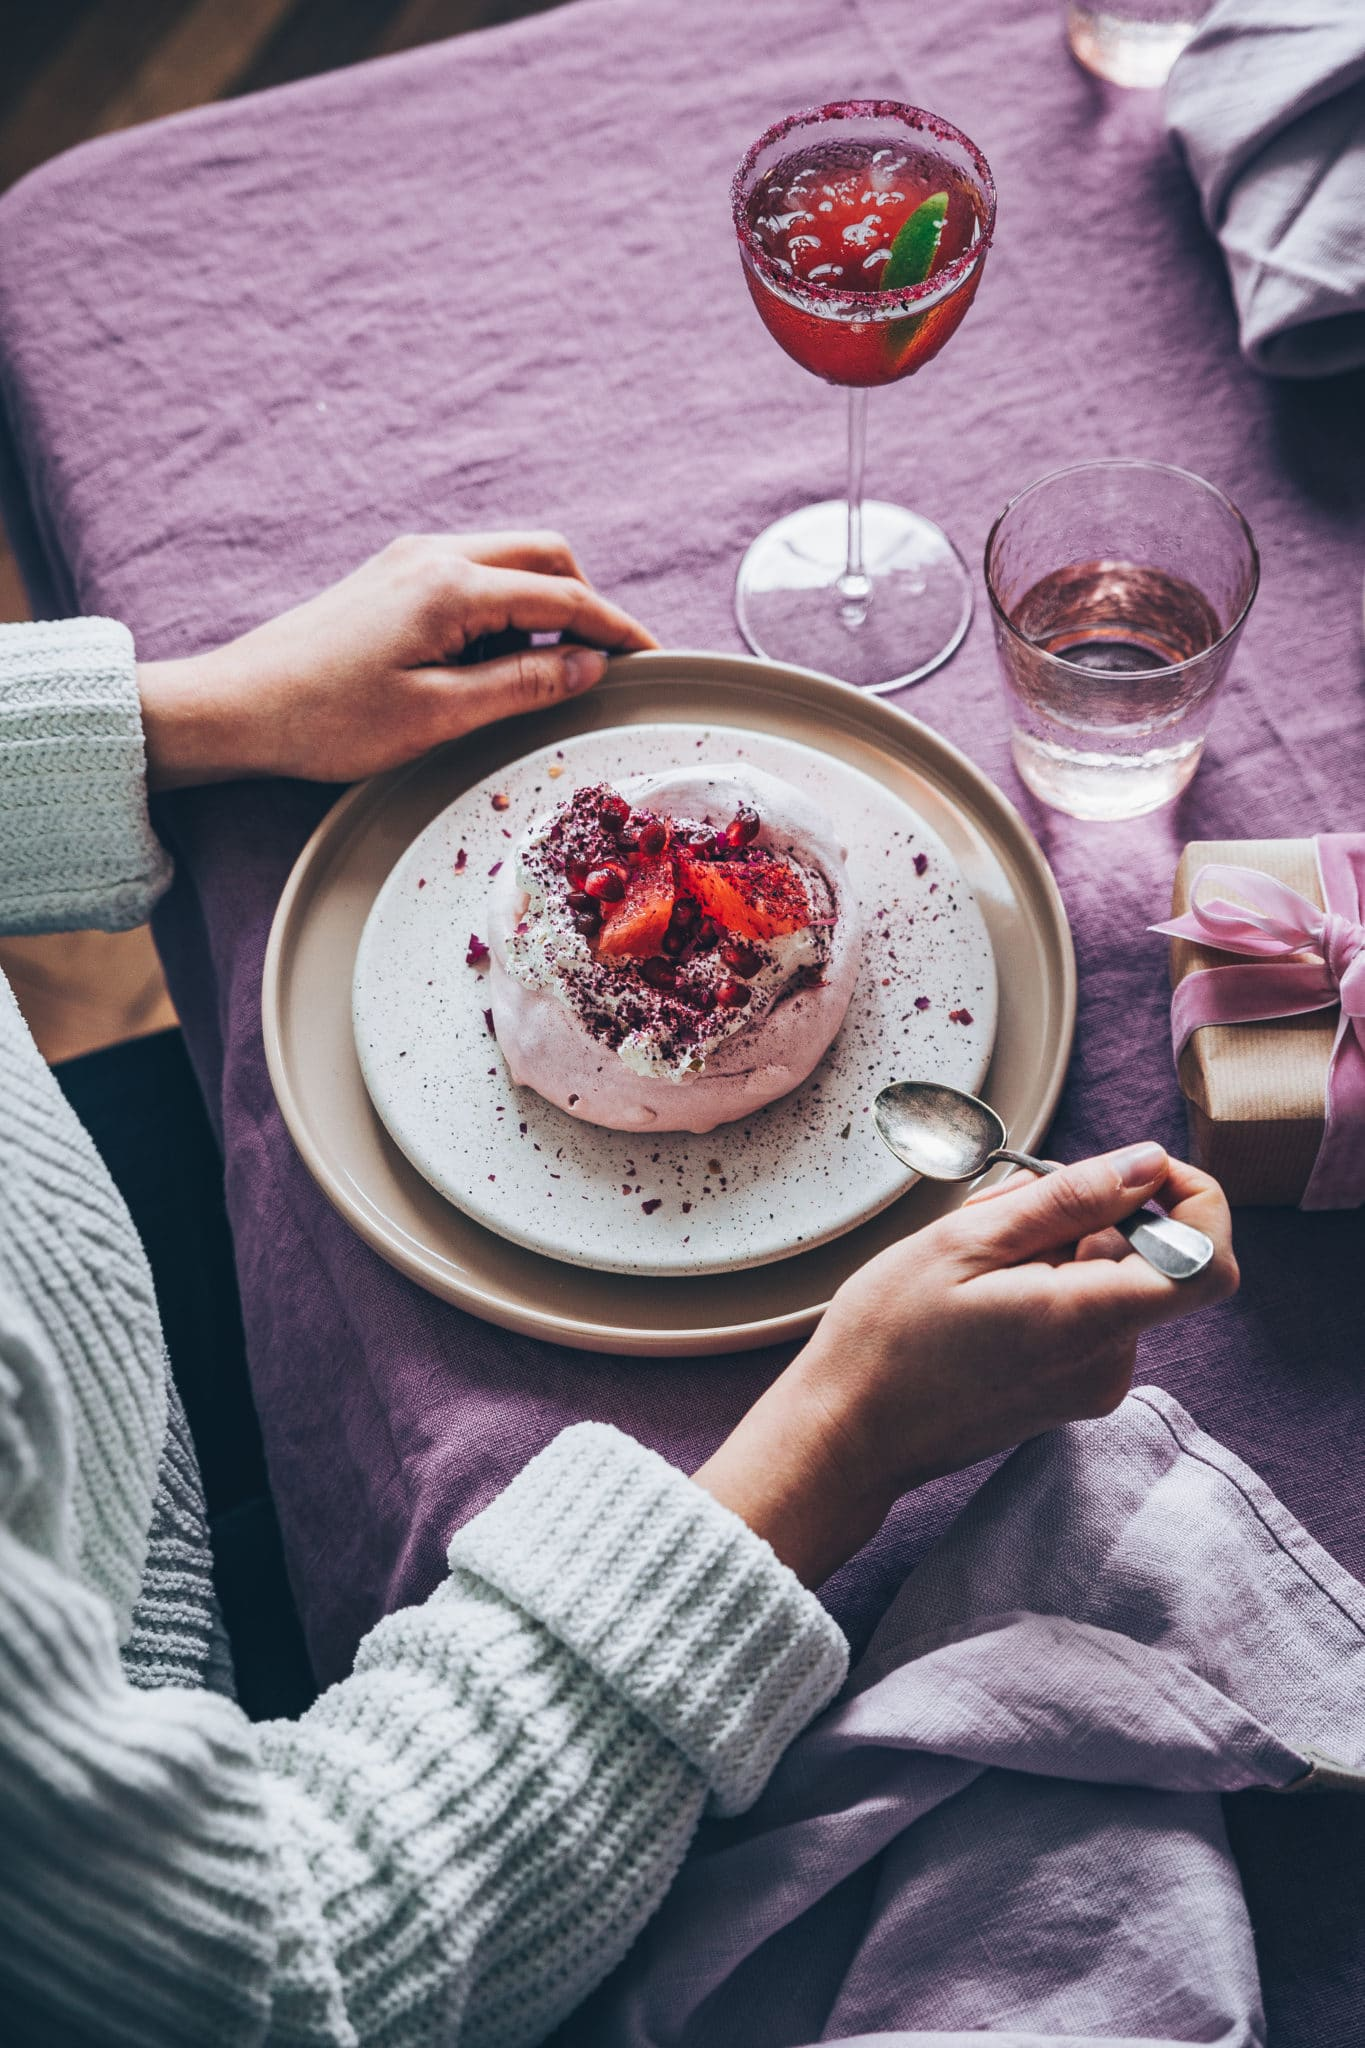 st valentin Mégane Arderighi megandcook